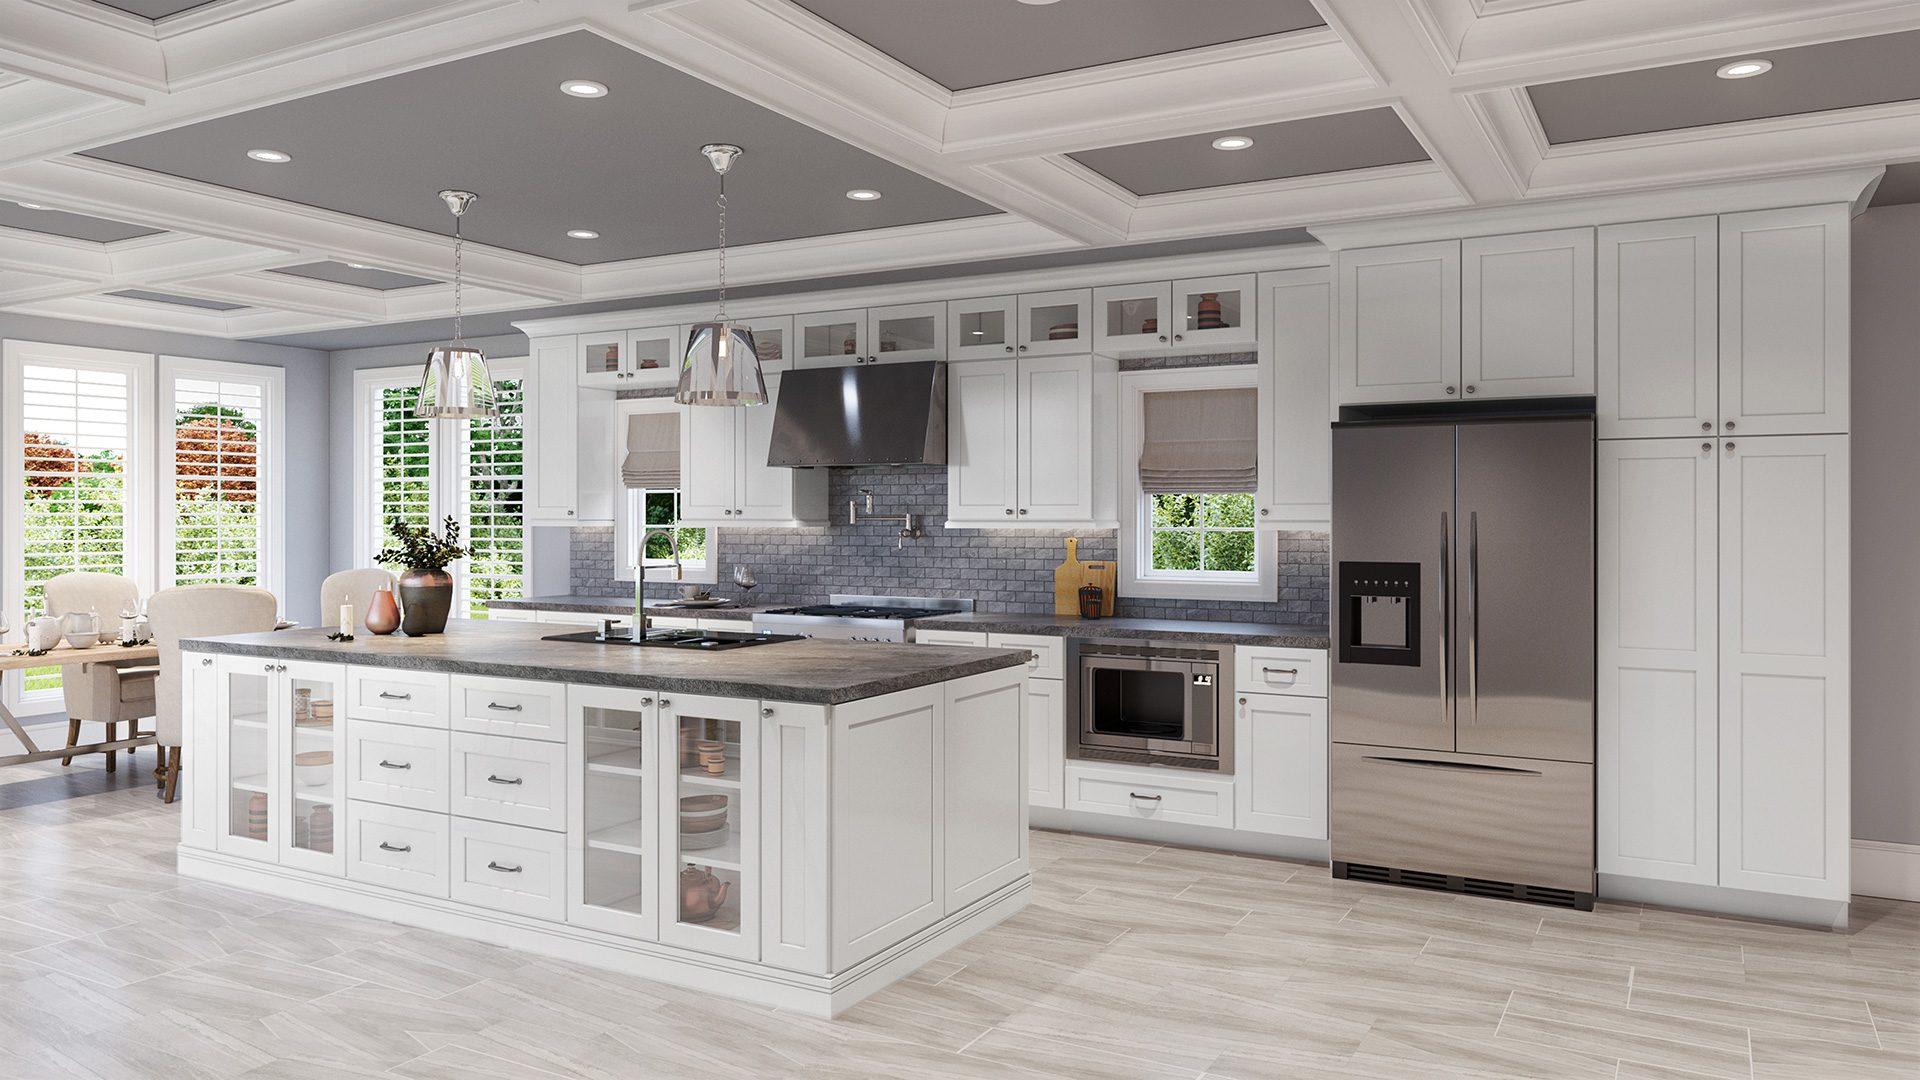 Timeless Shaker-style kitchen